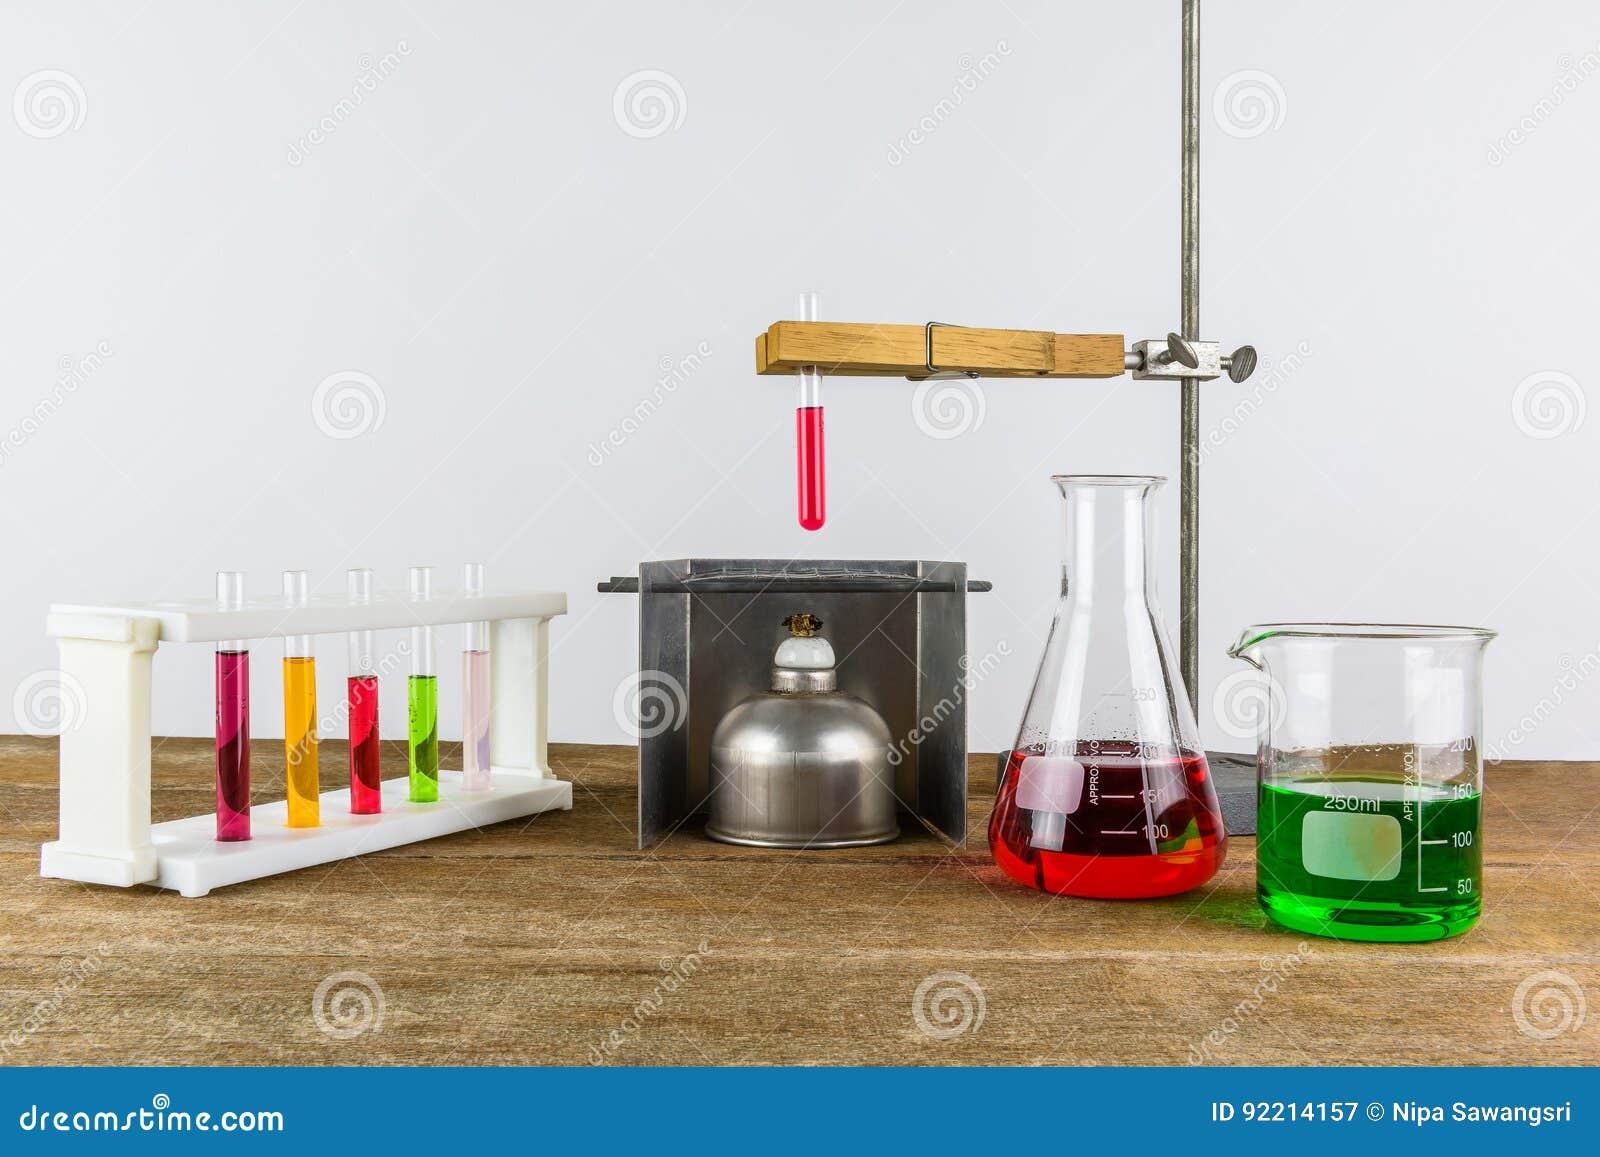 Laboratory Equipment Test Tube Holder And Alcohol Lamp, Test Tub ... for Laboratory Test Tube Holder  568zmd